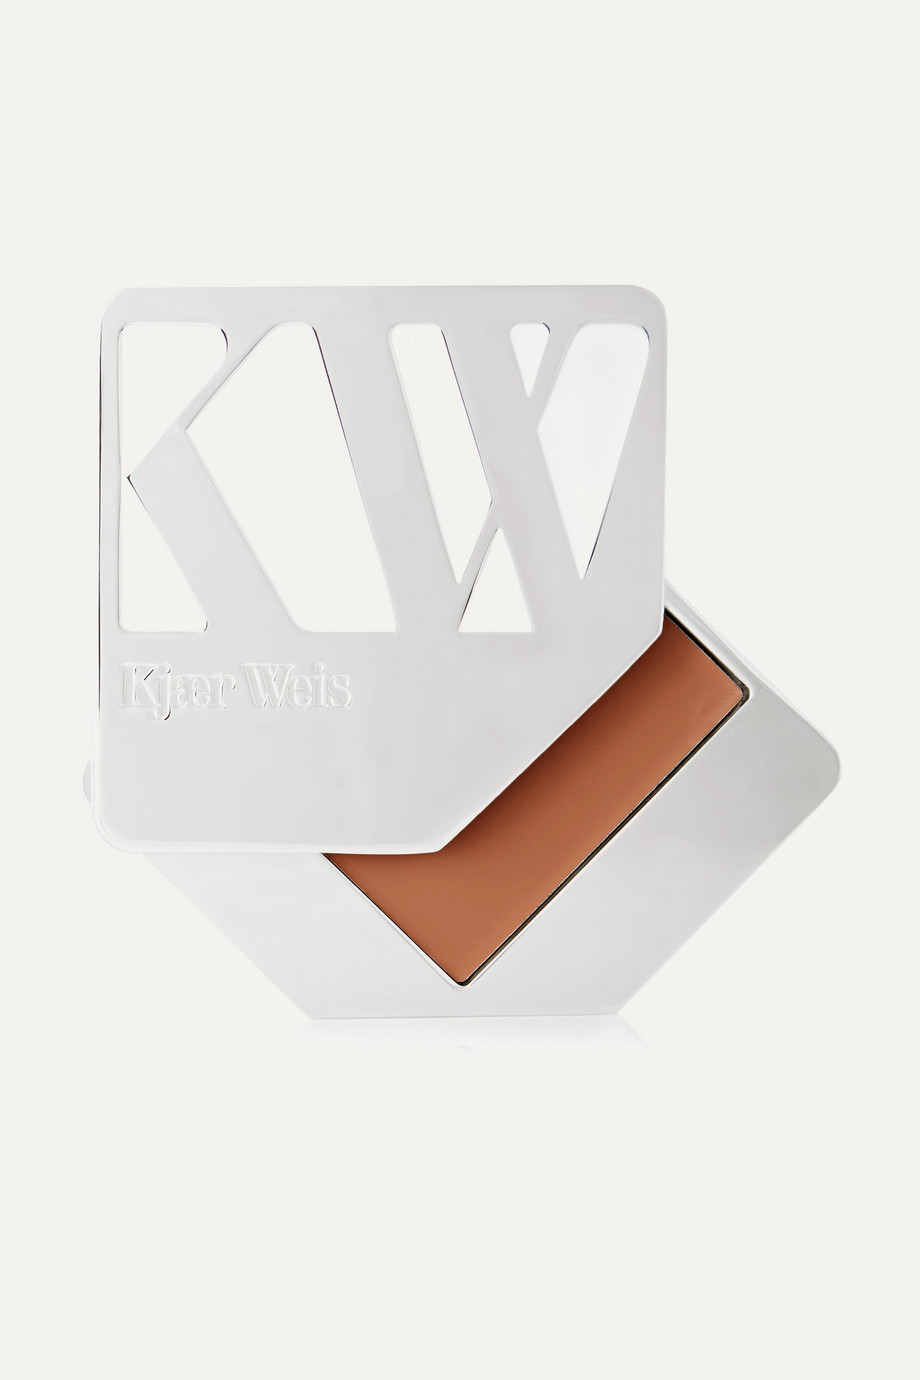 Kjaer Weis Cream Foundation - Perfection